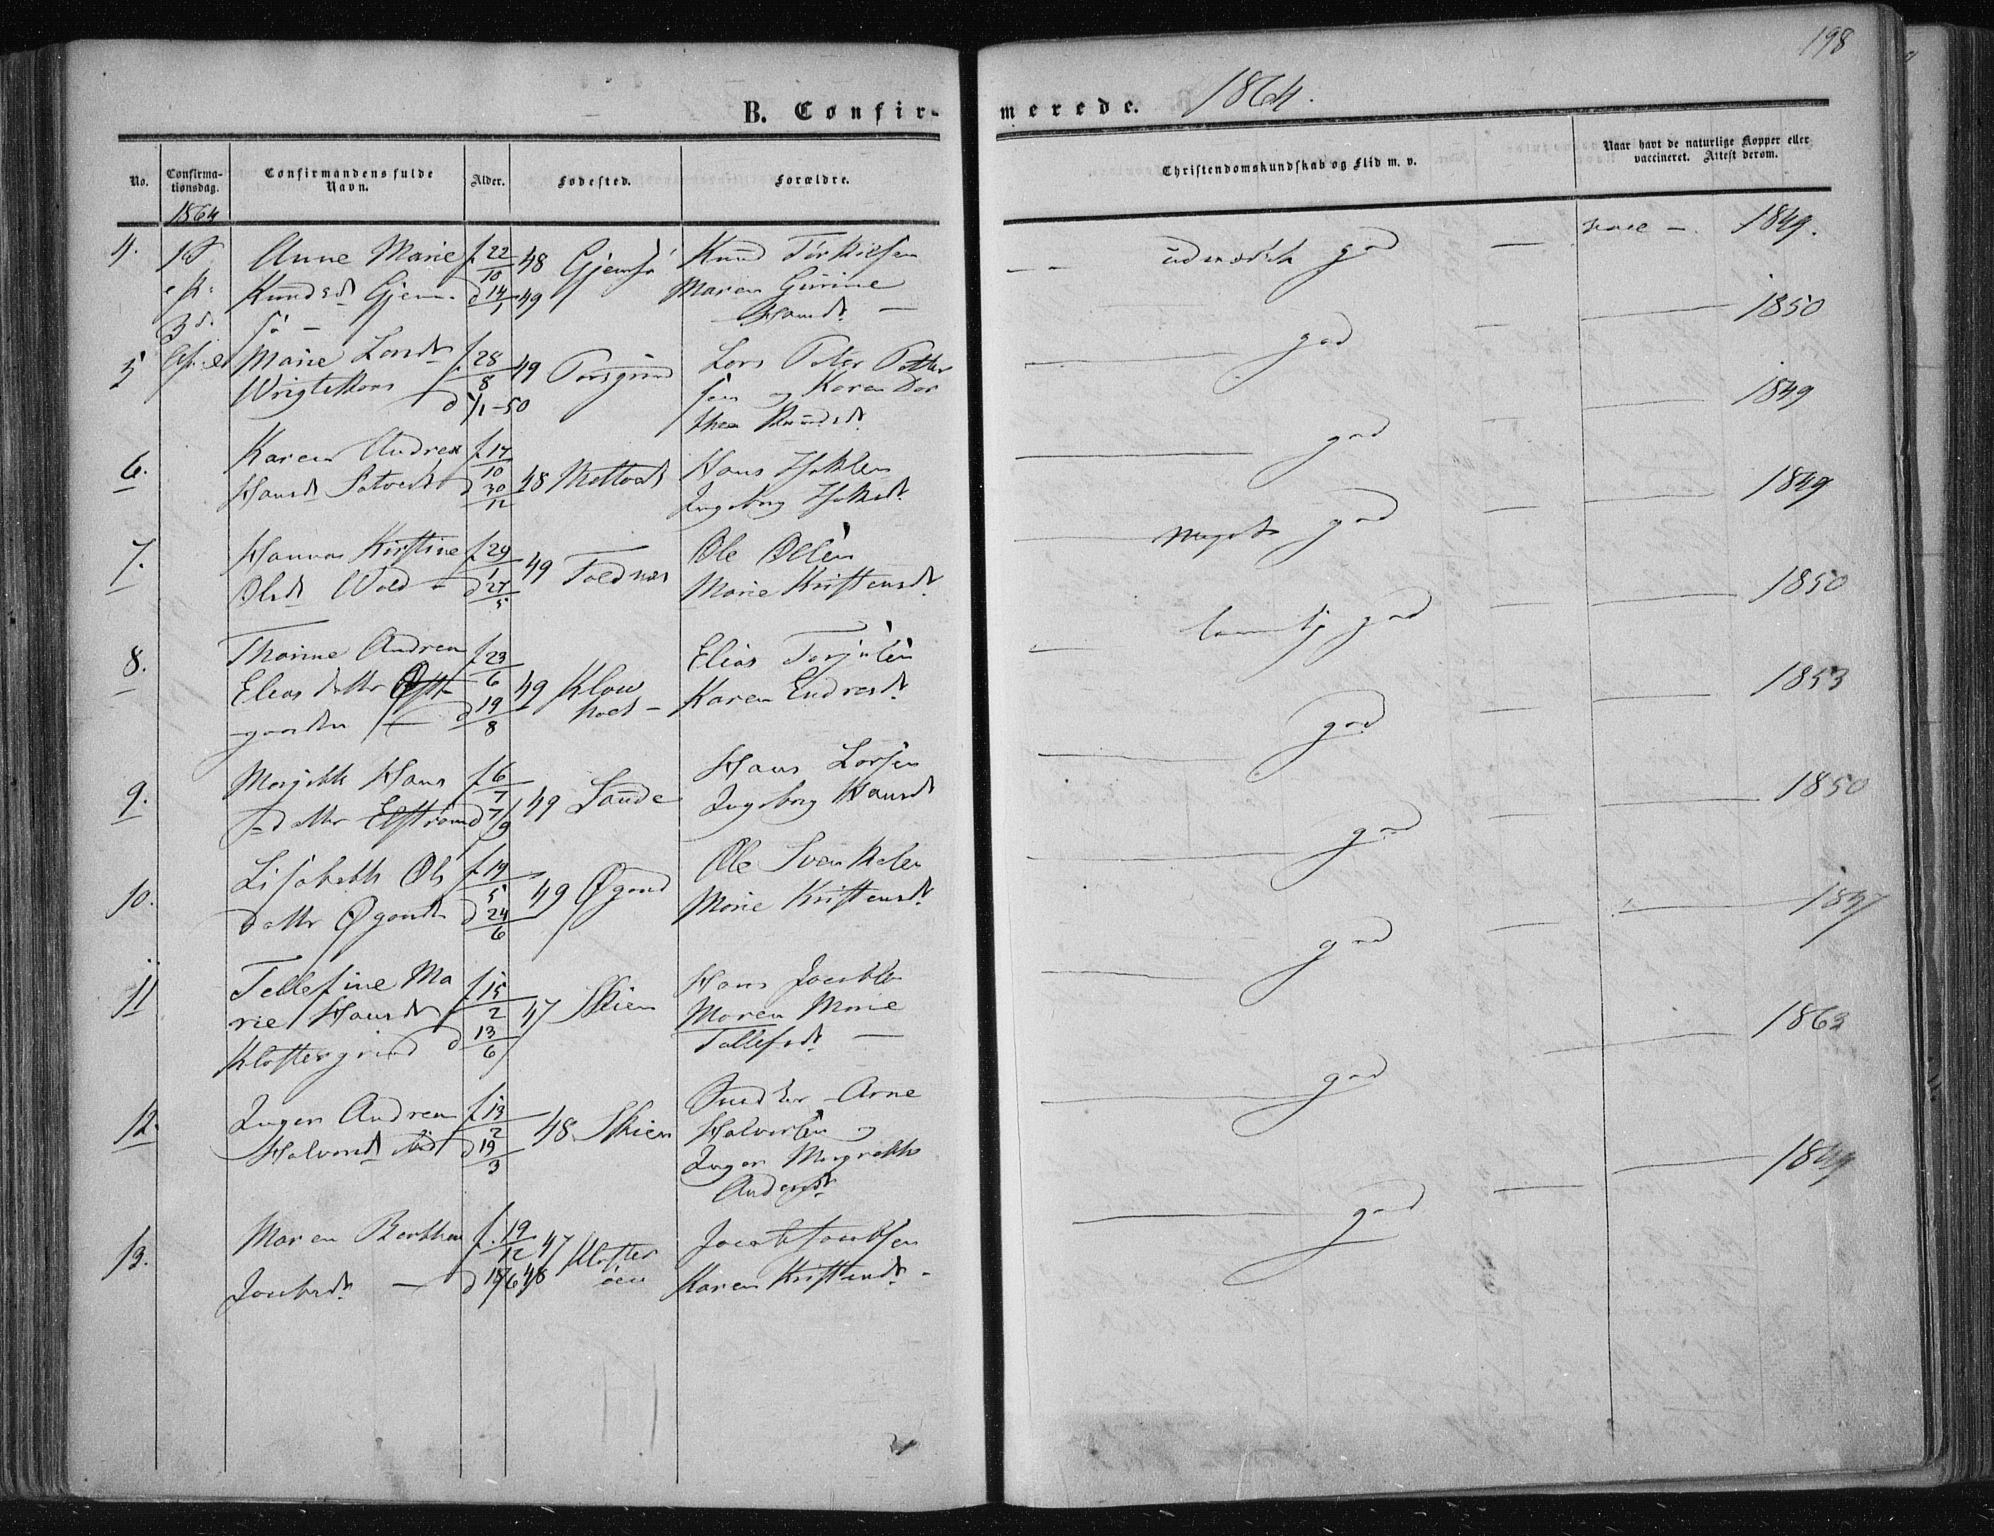 SAKO, Solum kirkebøker, F/Fa/L0007: Ministerialbok nr. I 7, 1856-1864, s. 198